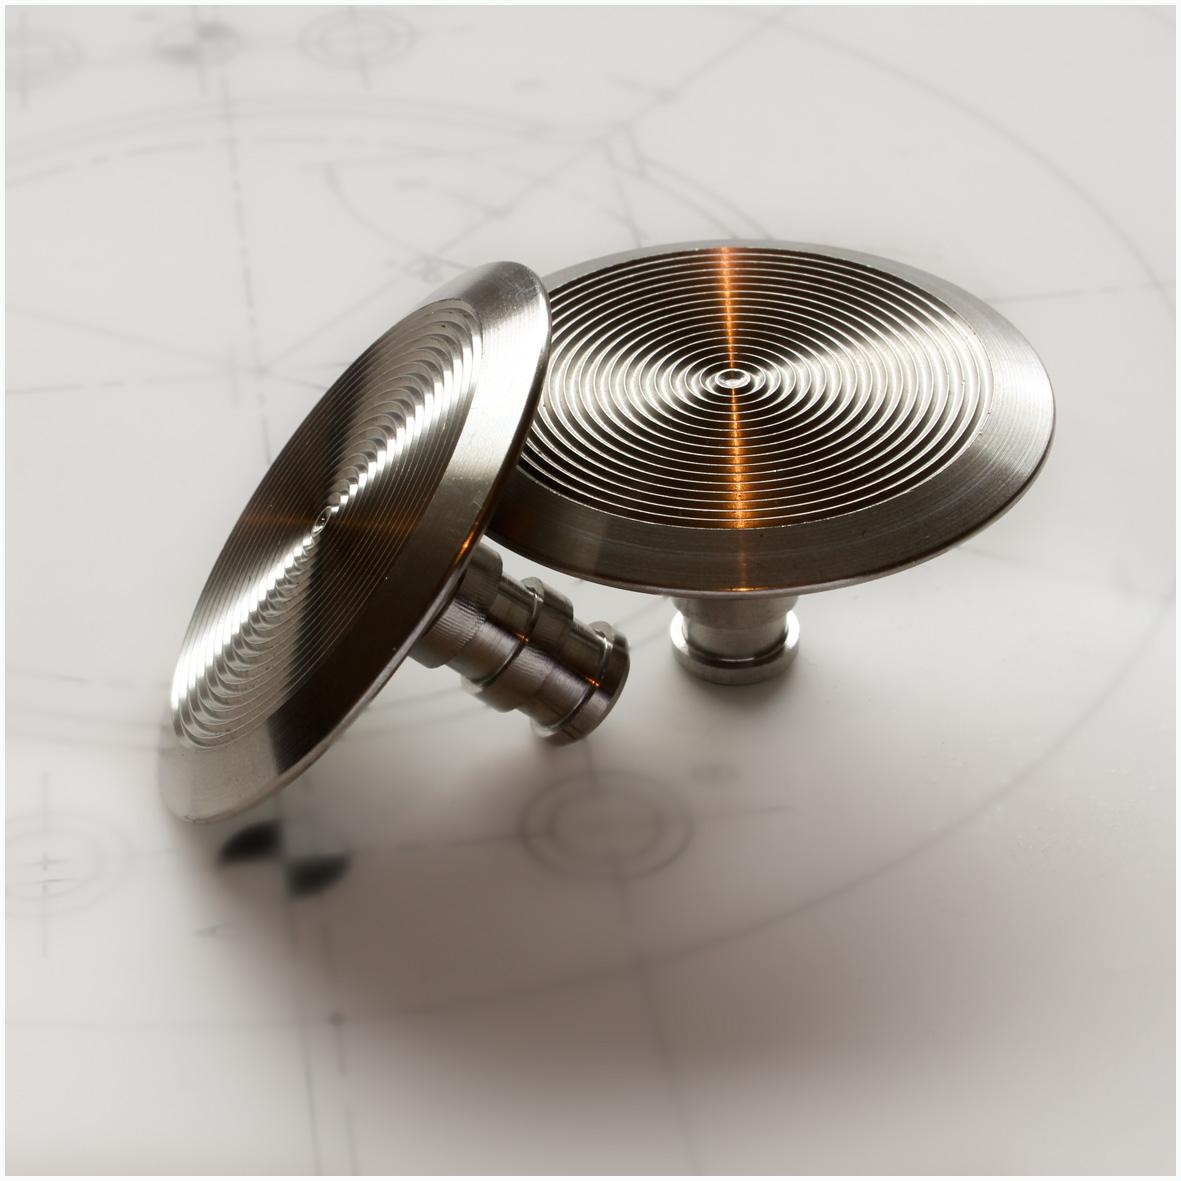 Stainless Steel Low Profile Stud LP503-CV